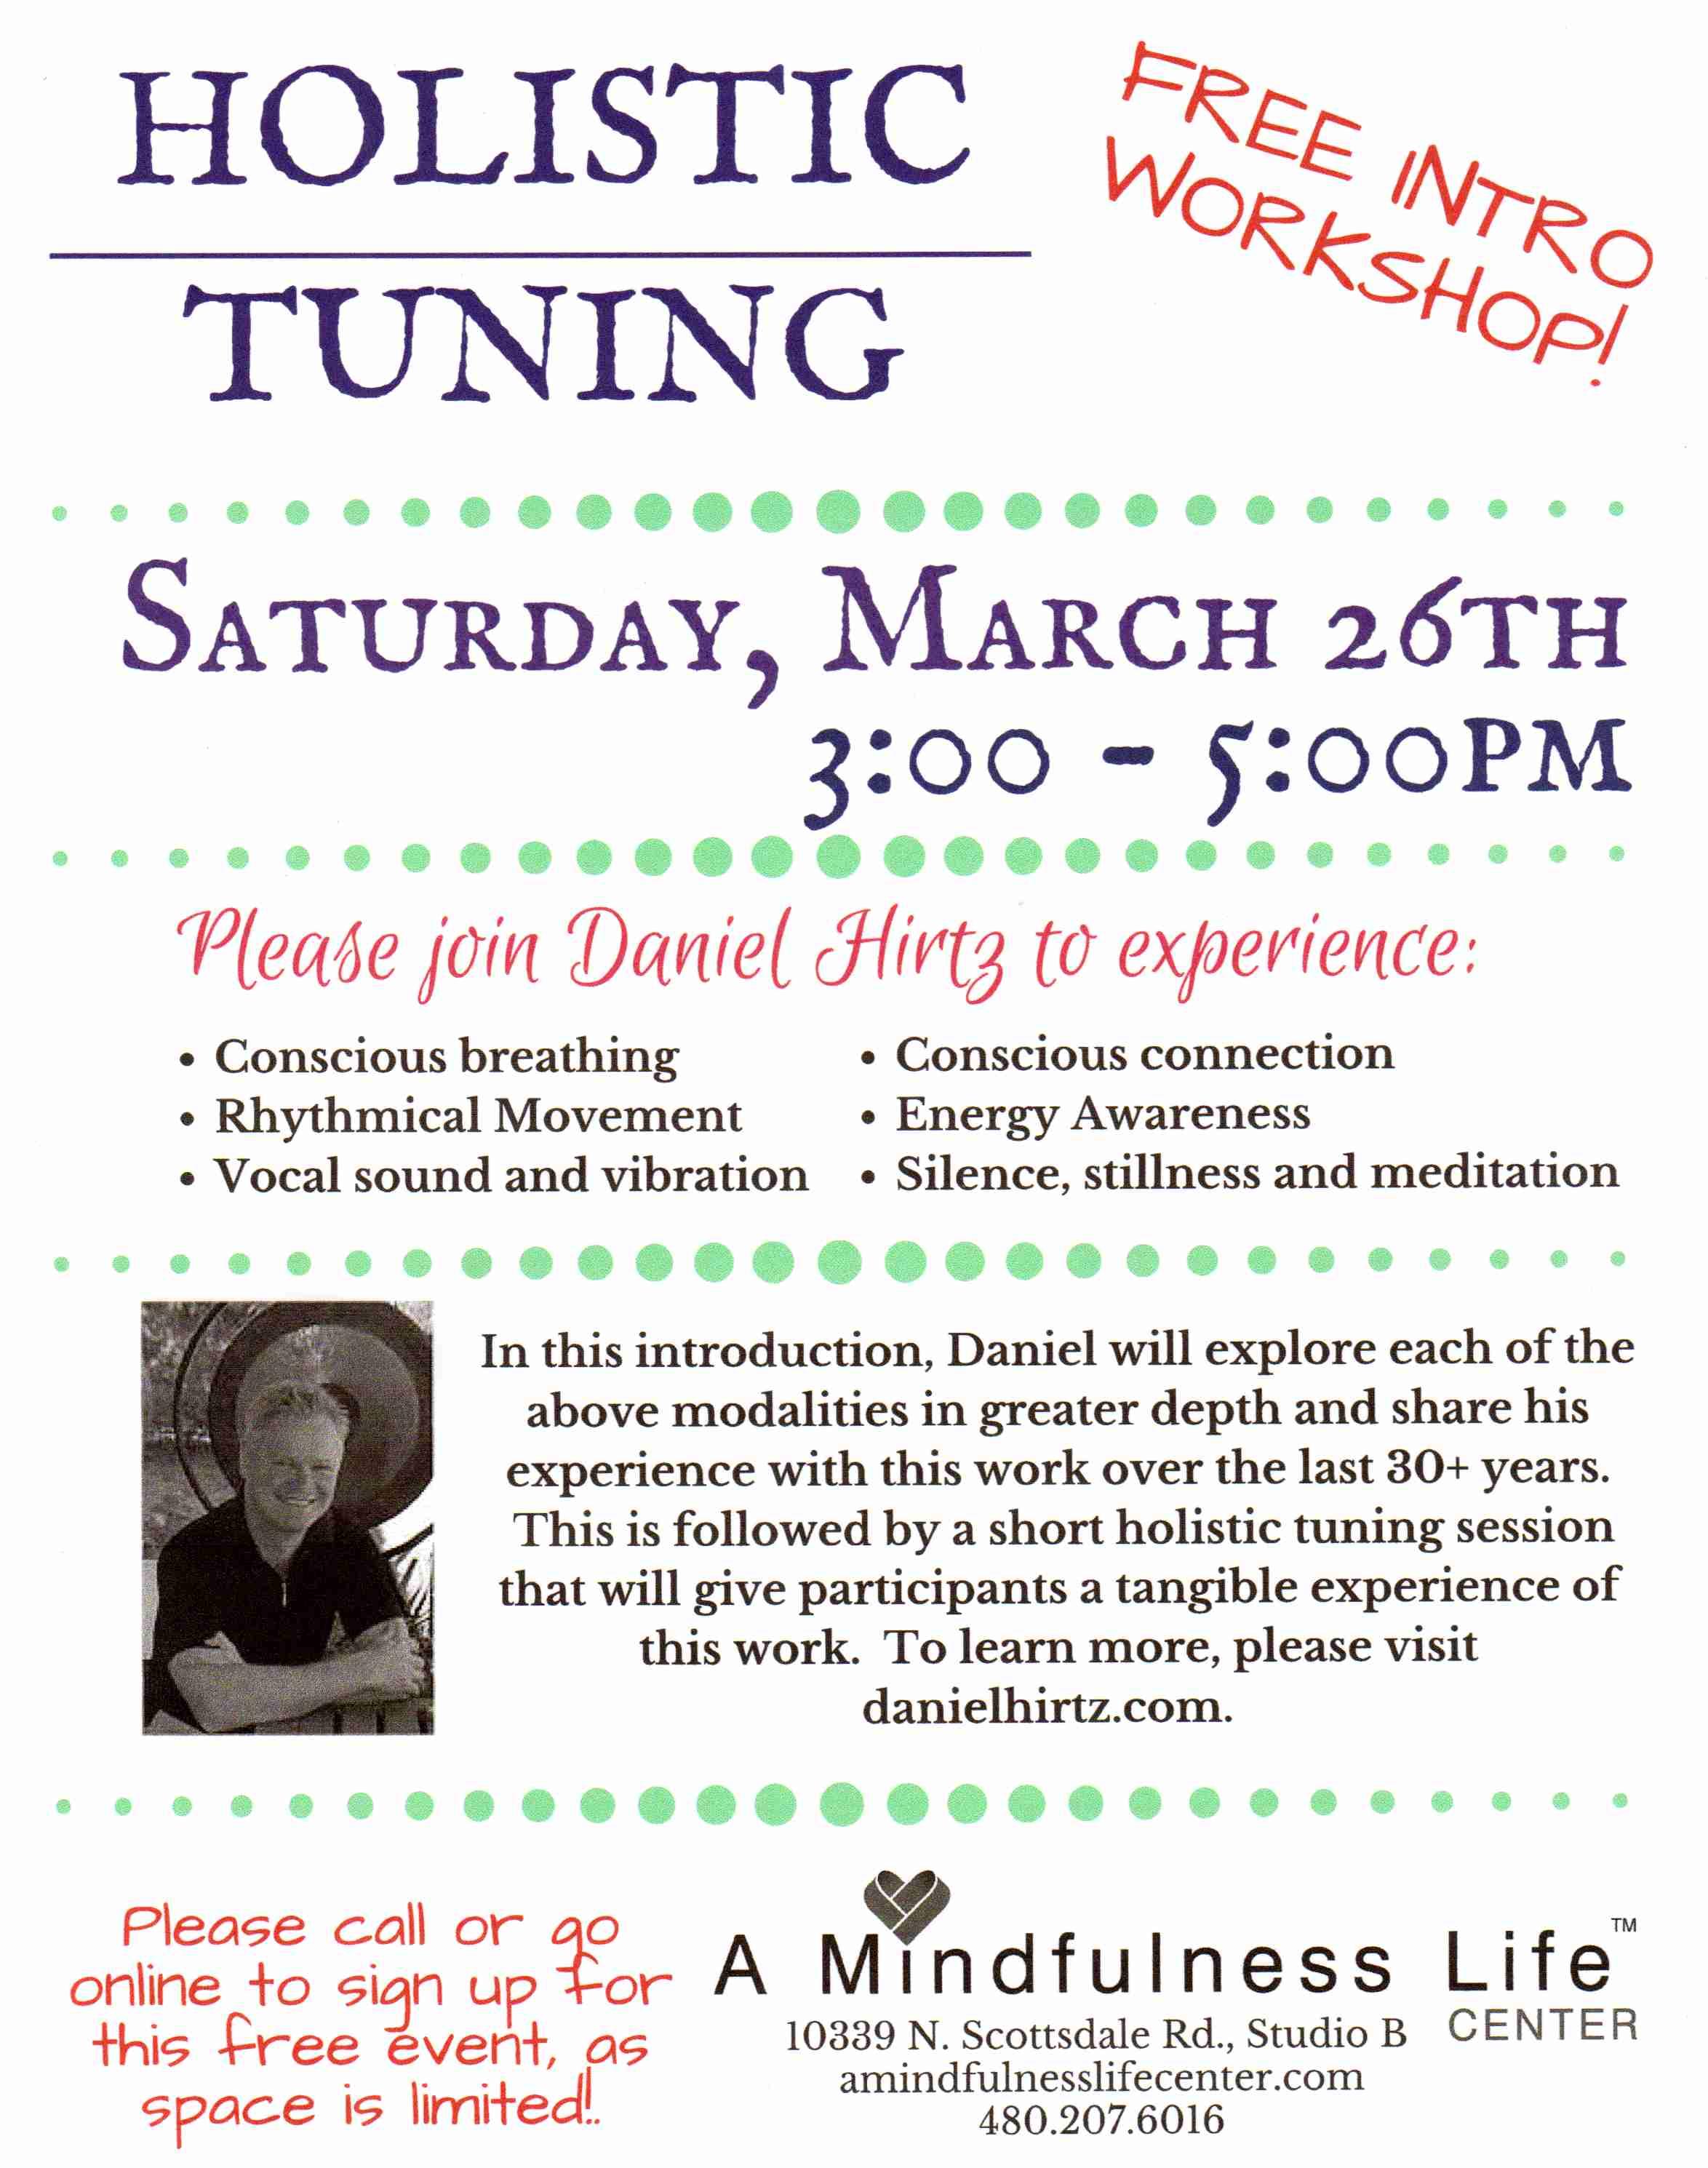 Holistic Tuning - Free Introduction Workshop